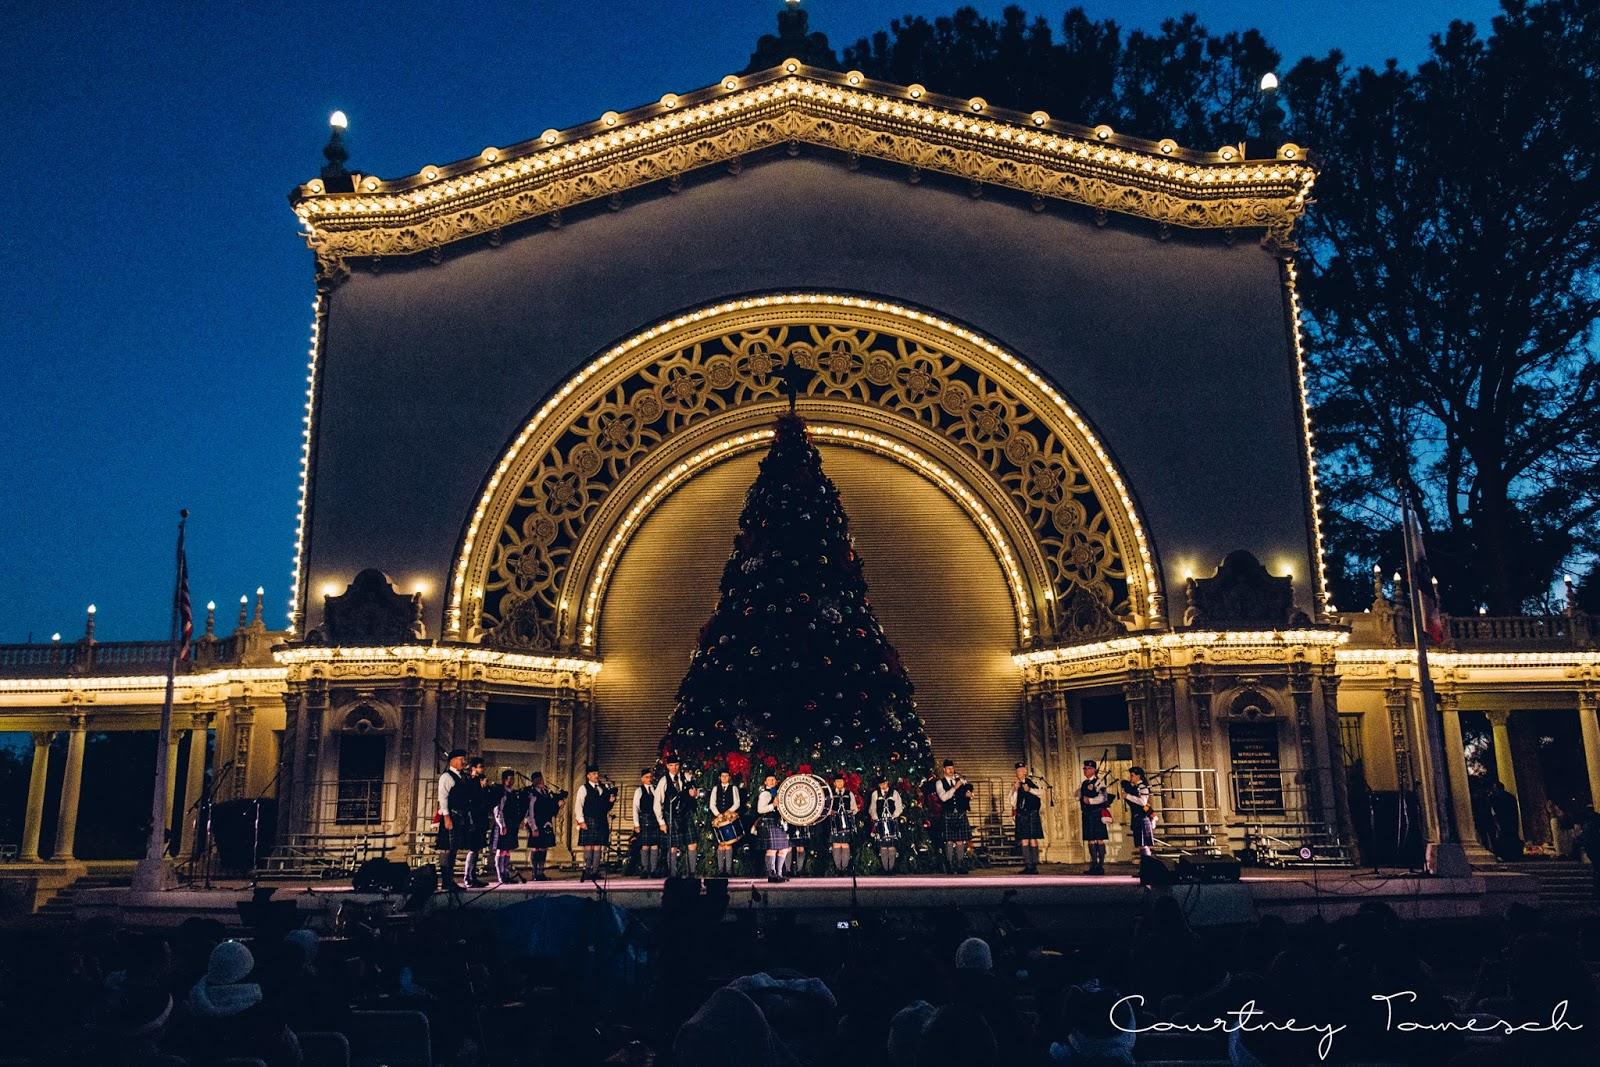 Courtney Tomesch Balboa Park December Nights 2016